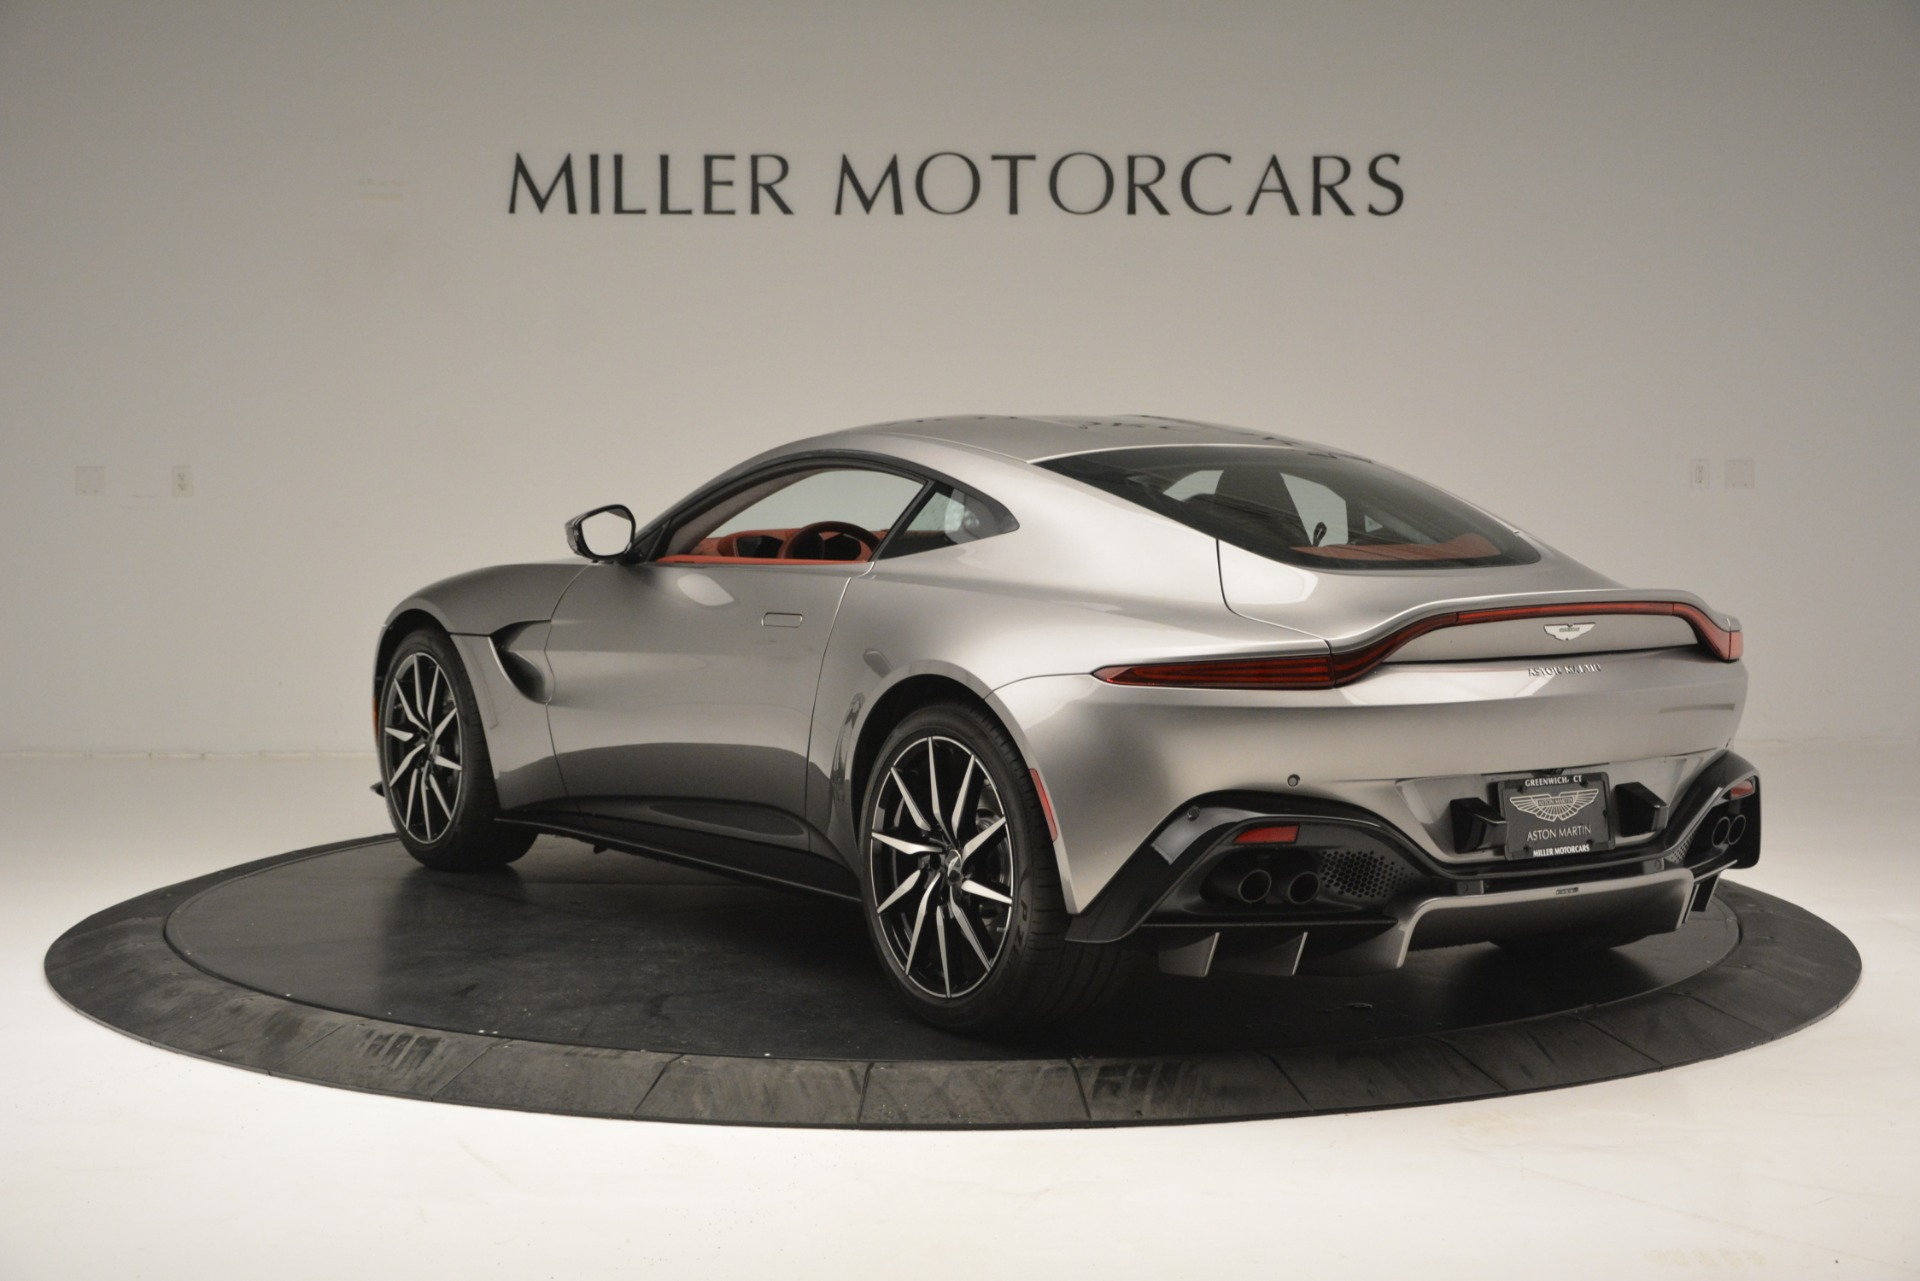 New 2019 Aston Martin Vantage  For Sale In Westport, CT 2528_p5